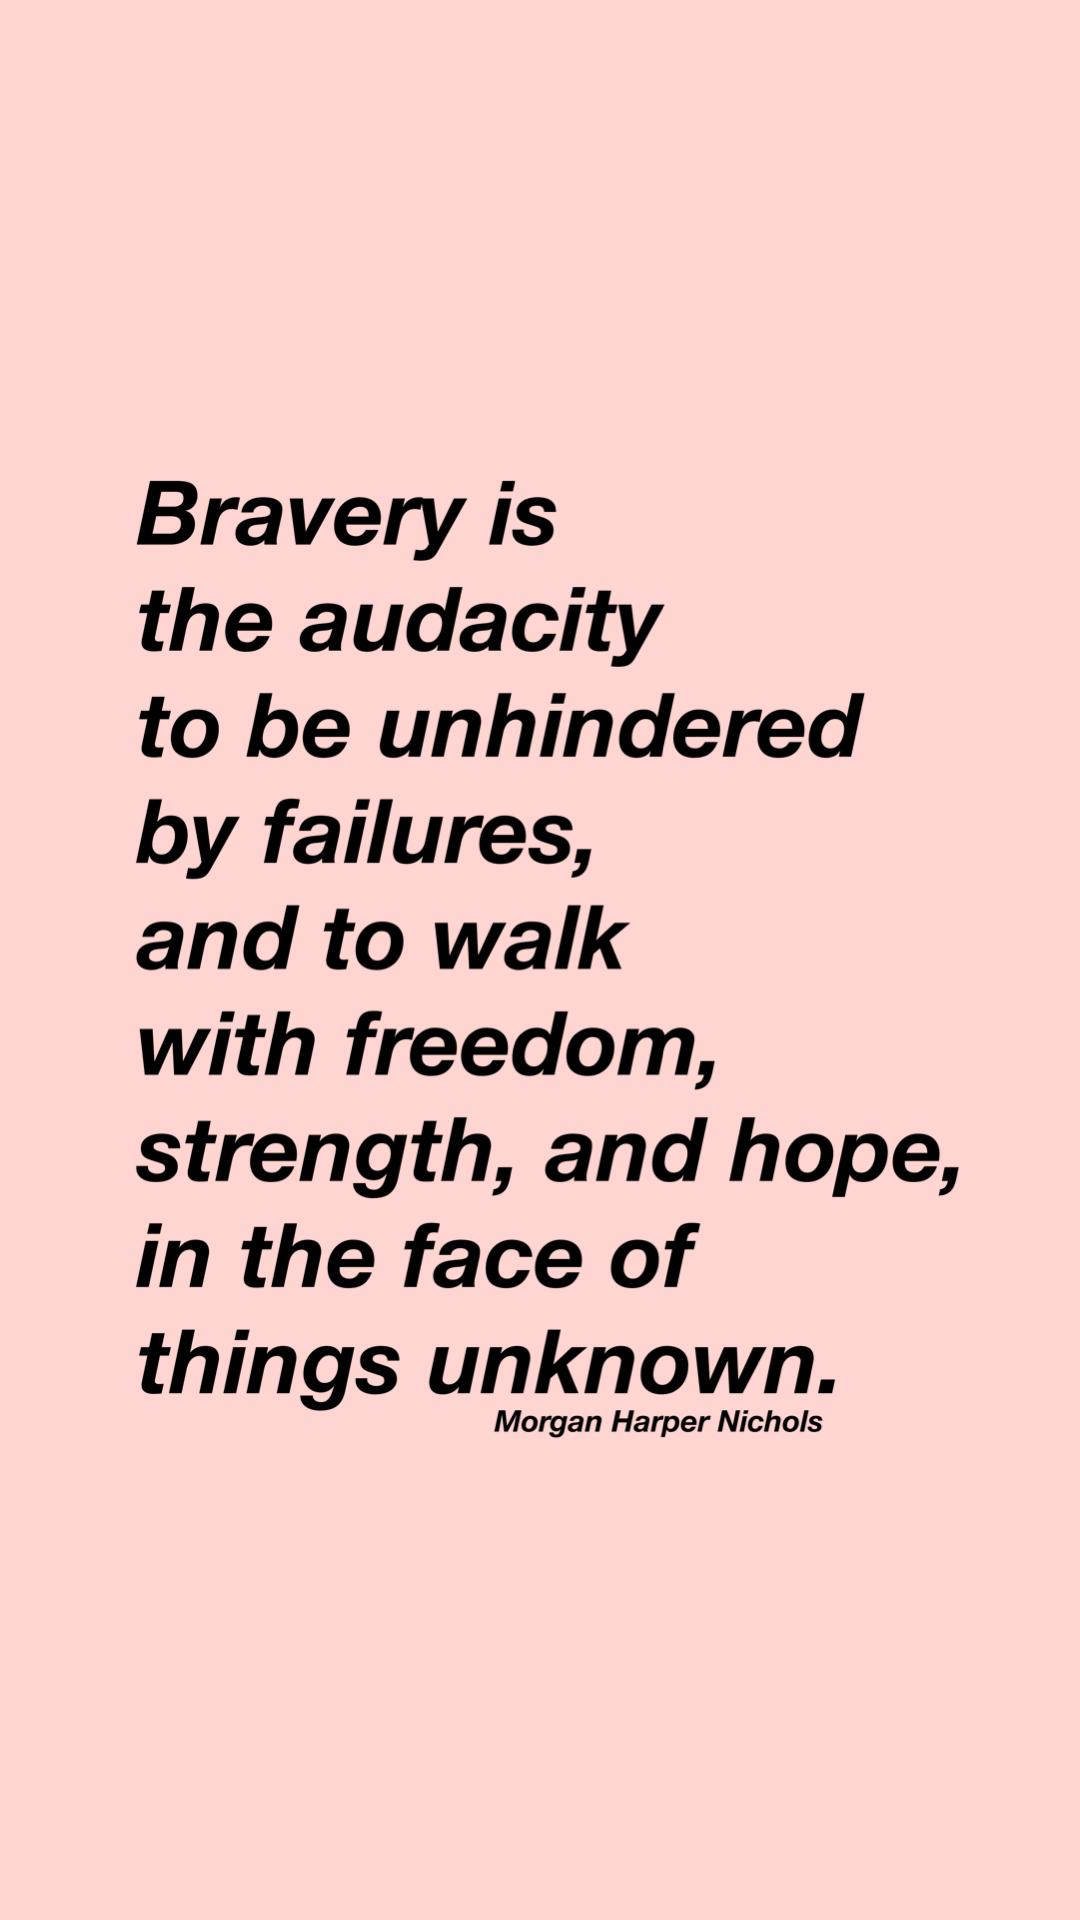 Bravery: